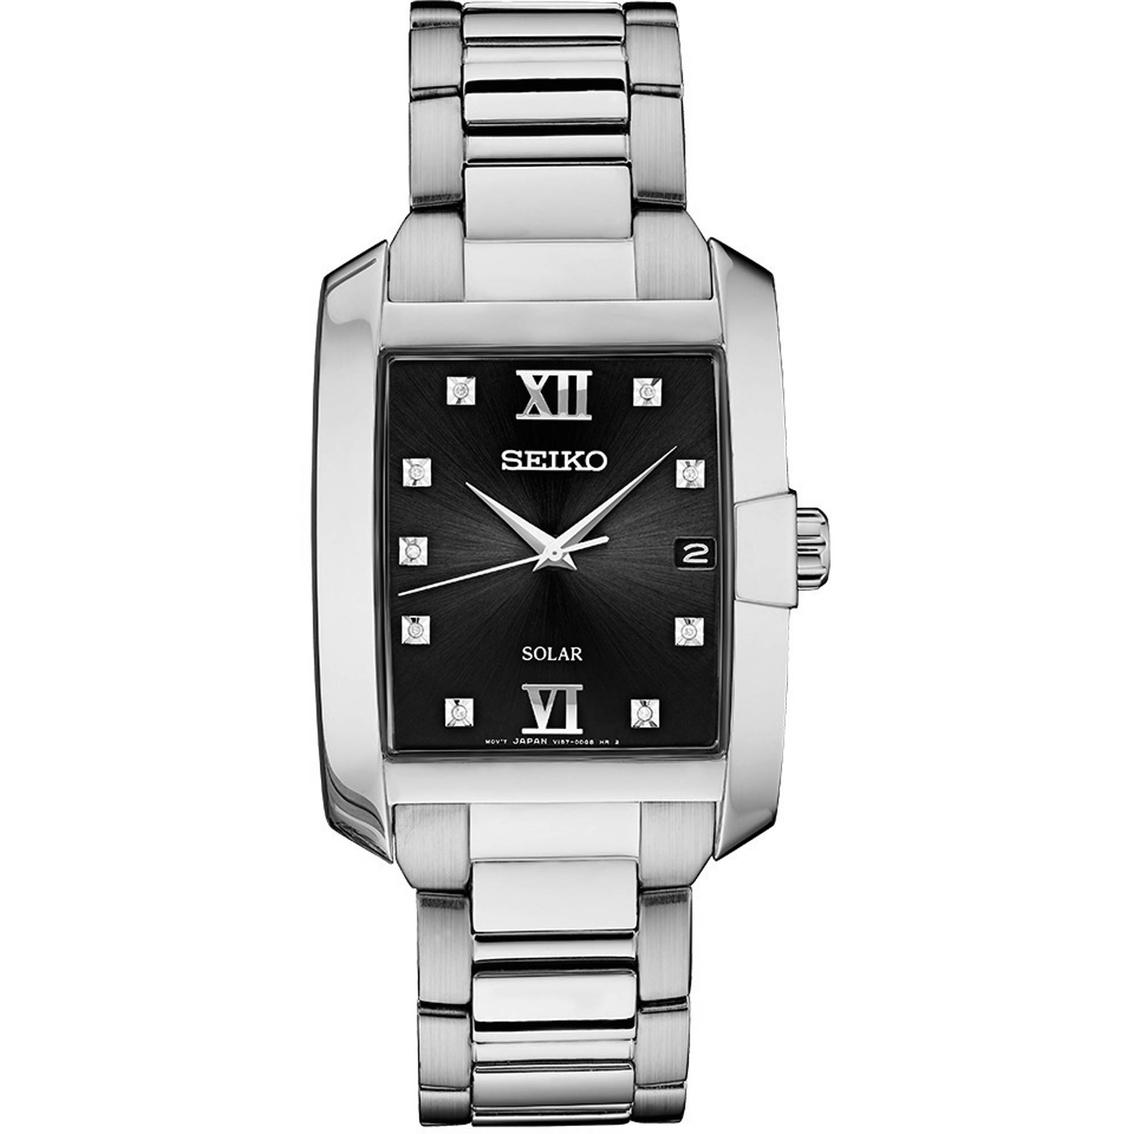 49affcdd95 Seiko Men s Core Diamond Accent Rectangular Case Solar Watch Sne46 ...